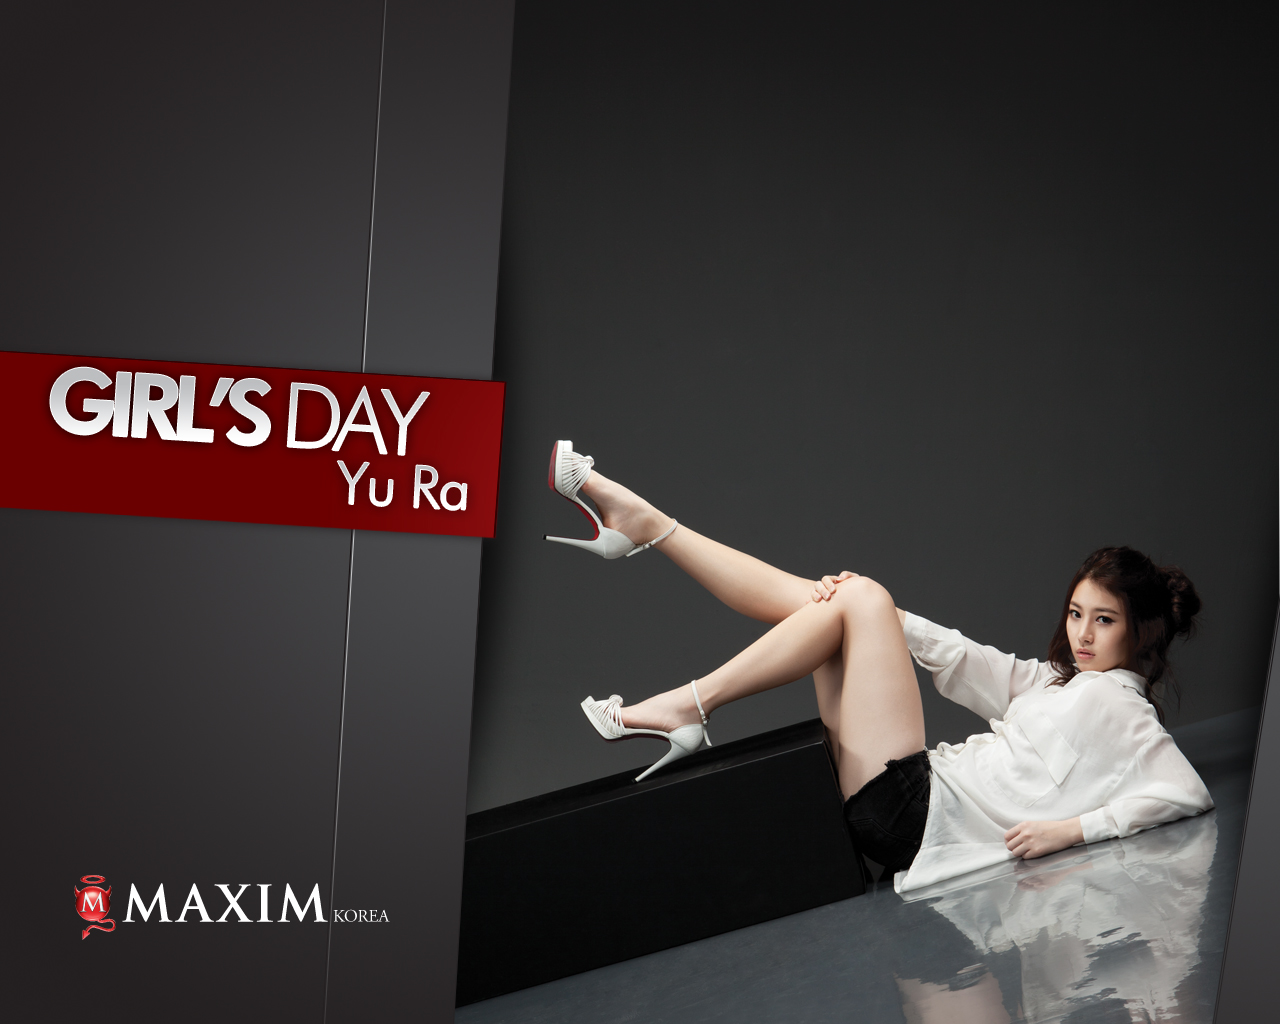 Wallpapers Girl S Day Maxim Korea Kpop Girls Clothing Brand Korean X ...